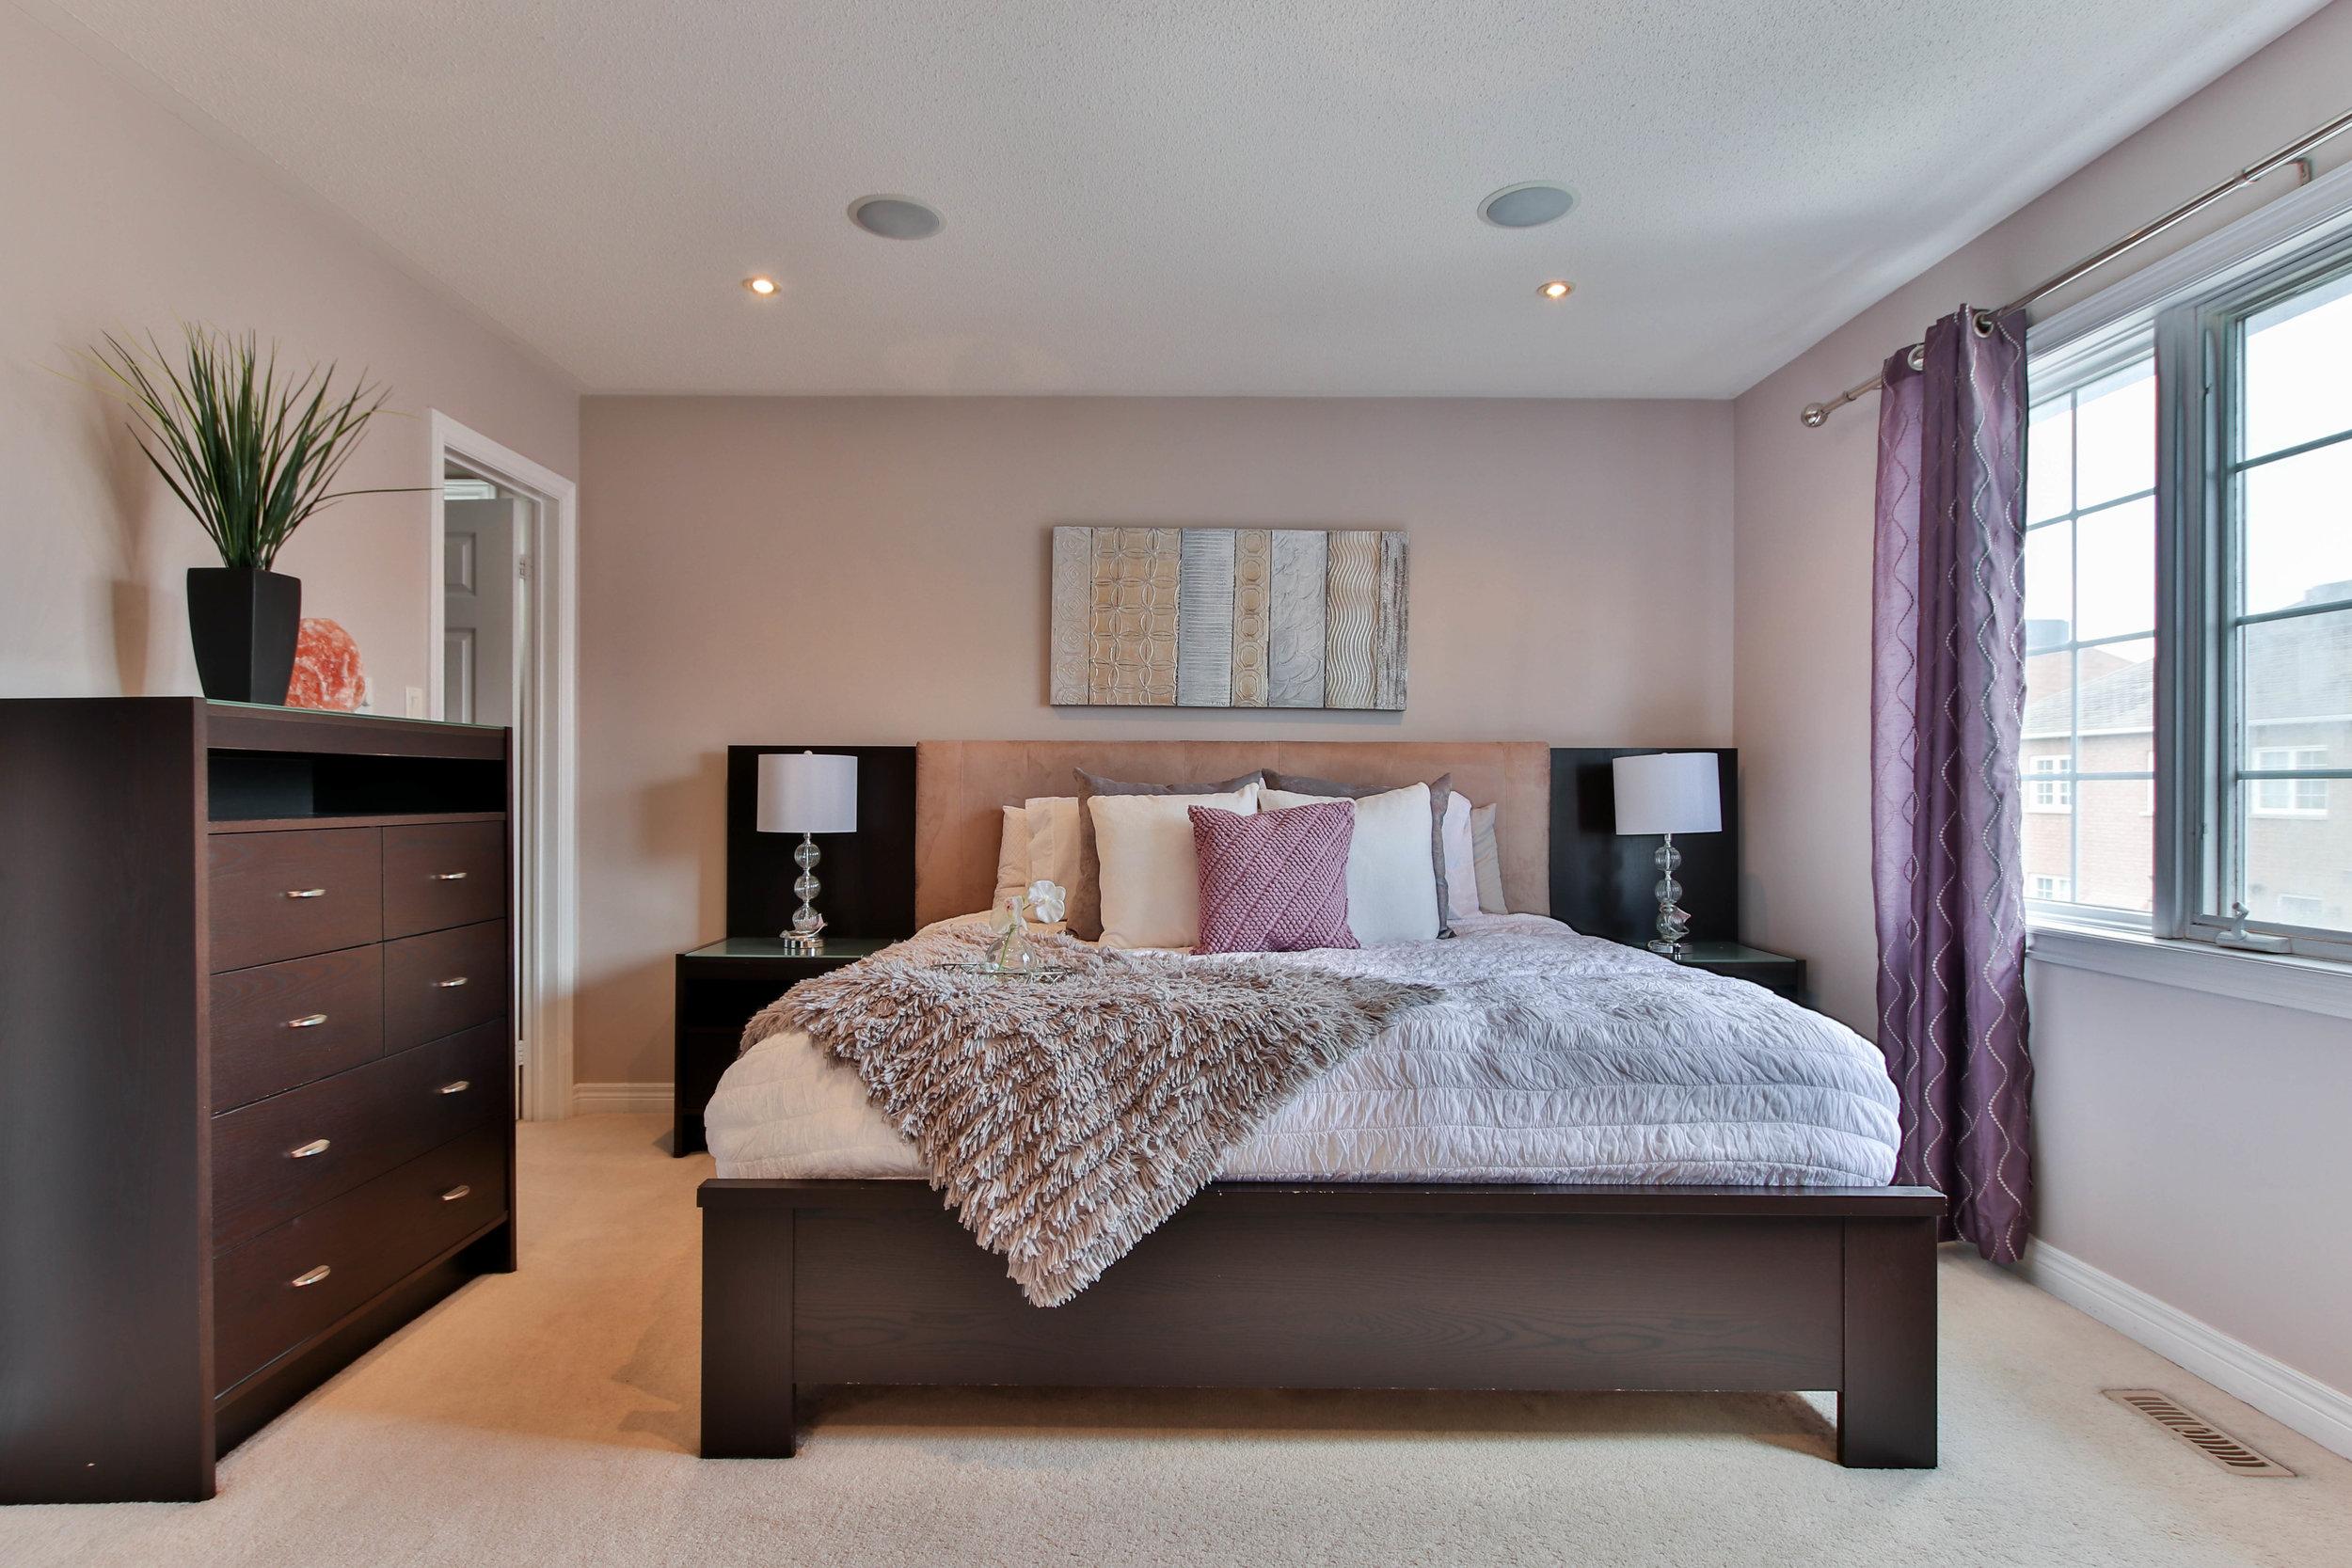 36_Bedroom (1 of 1).jpg